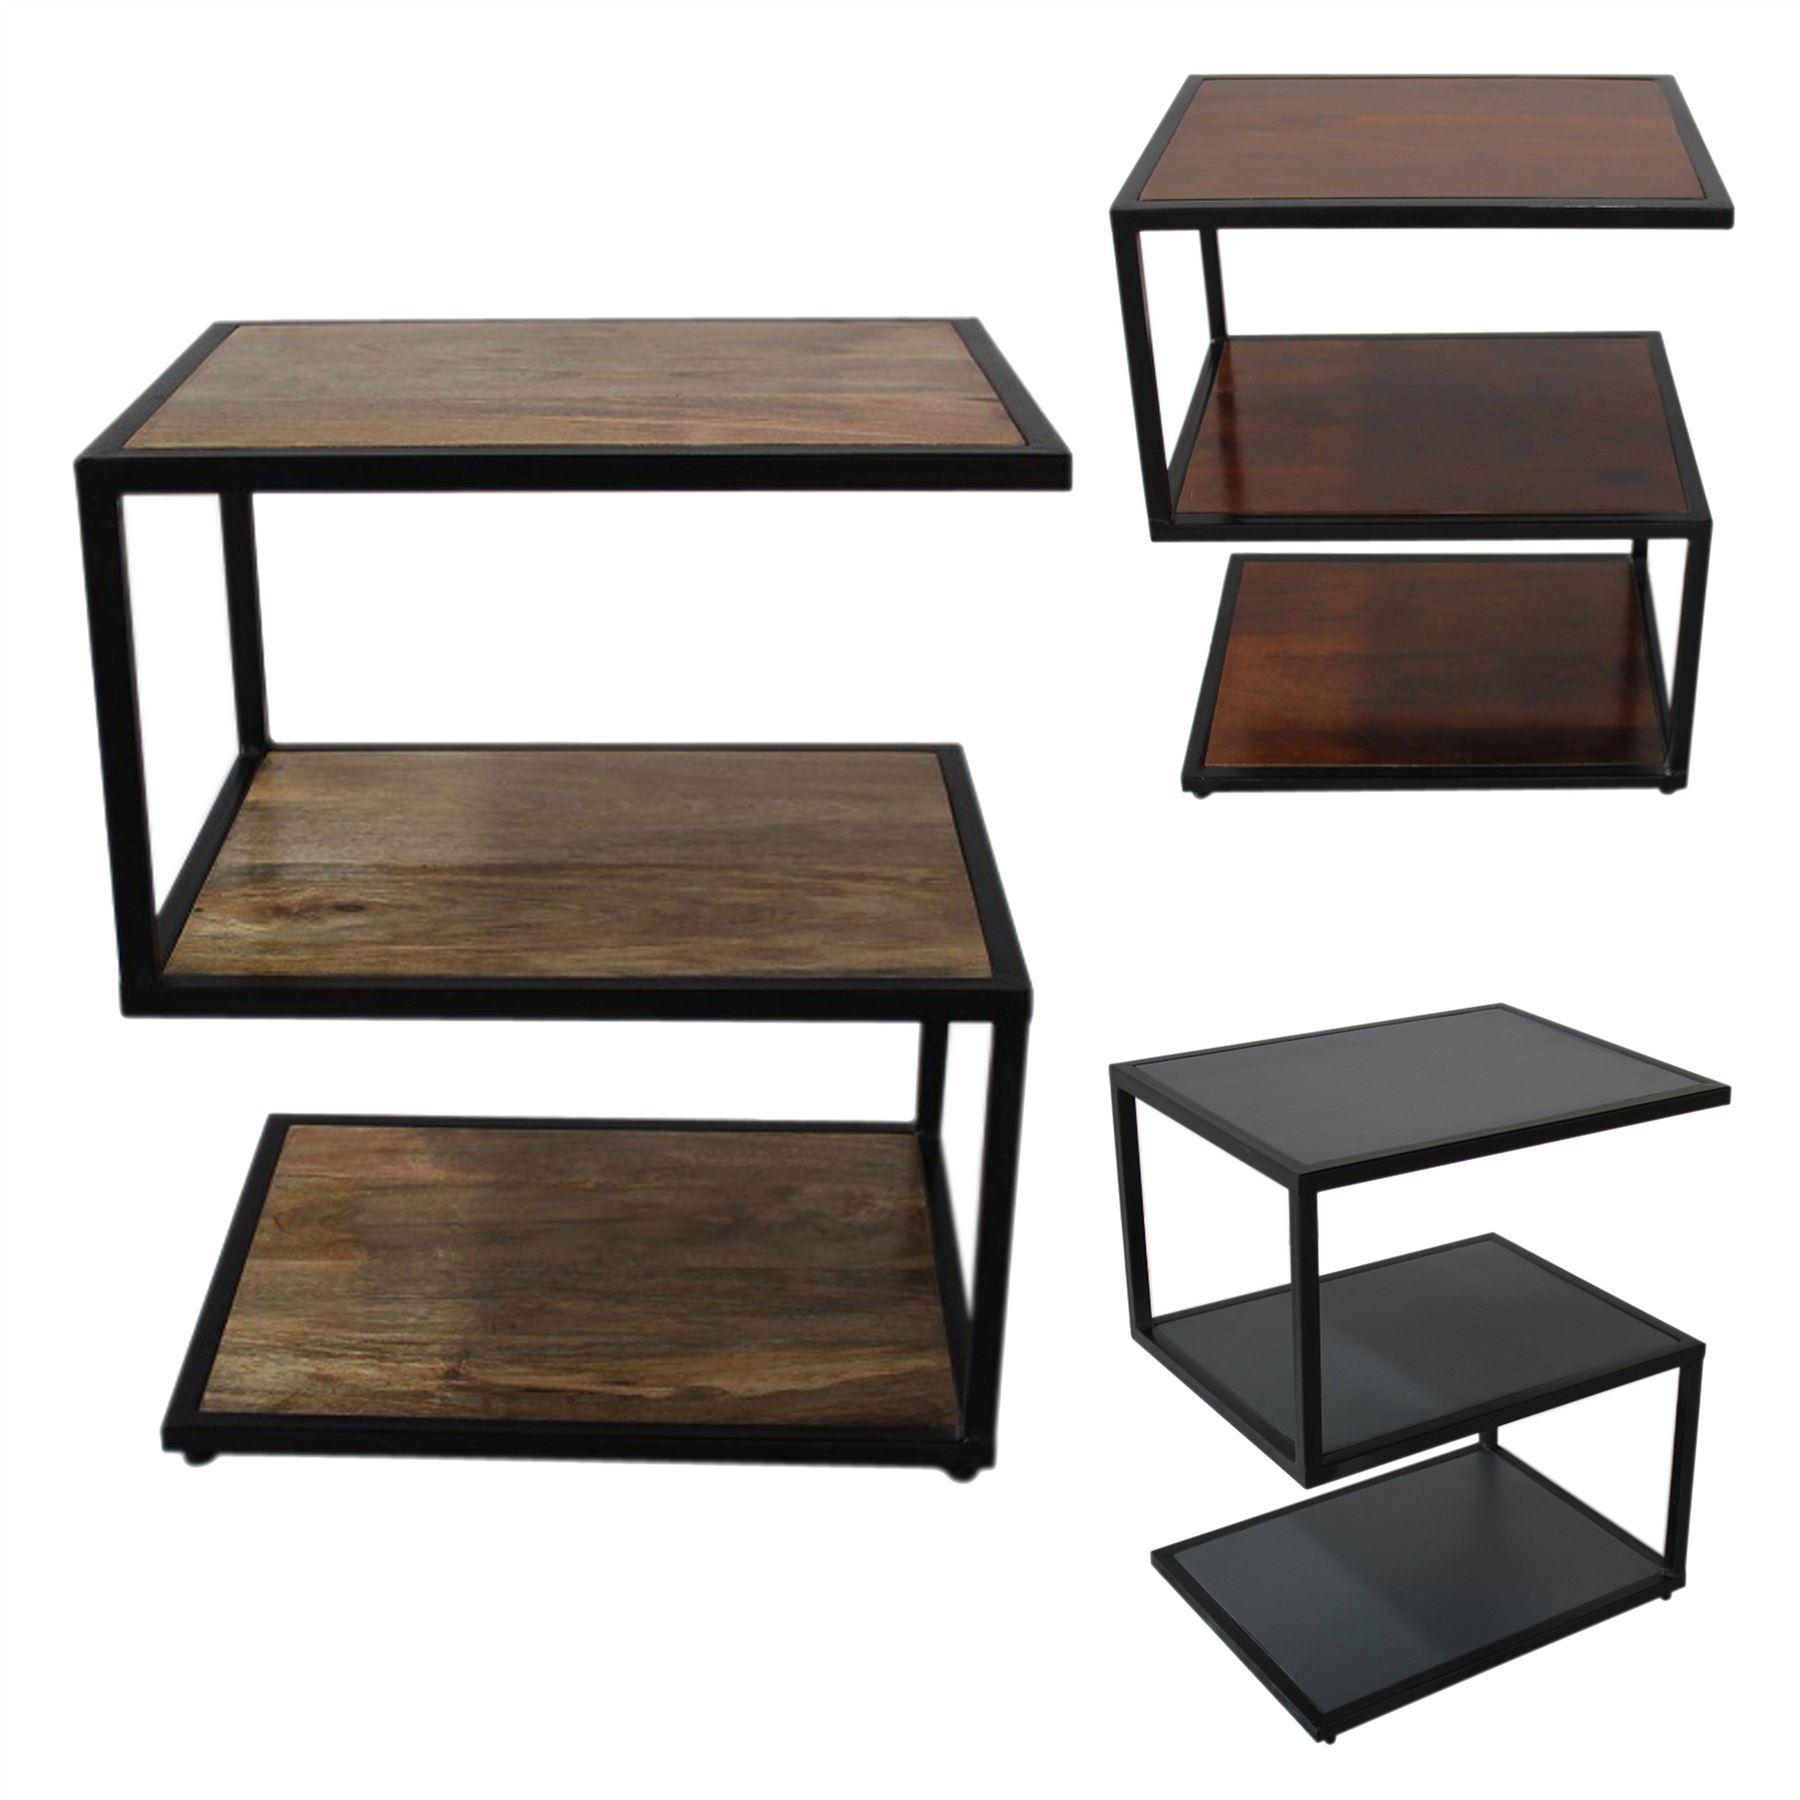 Details About Dakota S Shape Side Table Mango Wood Natural Grey Dark Shade With Metal Frame